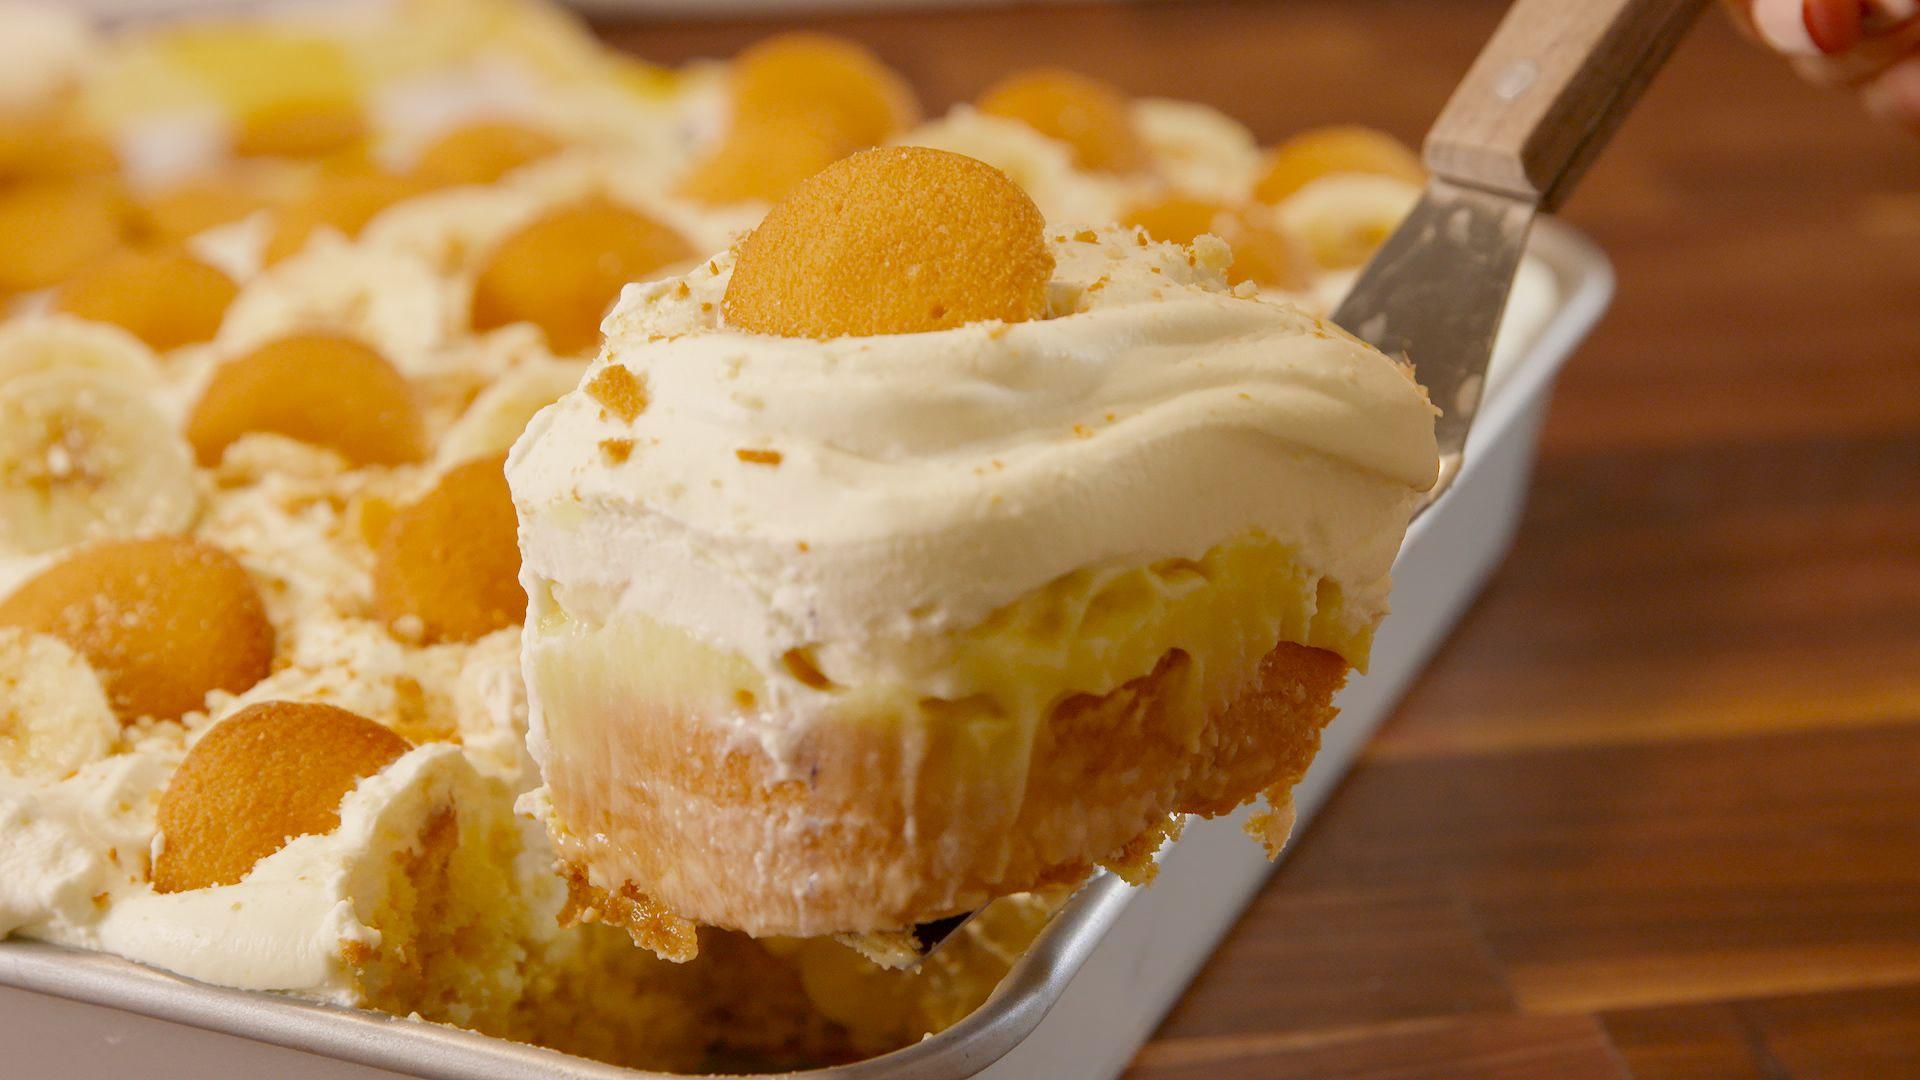 Unusual dessert without baking: cooking cake Broken glass